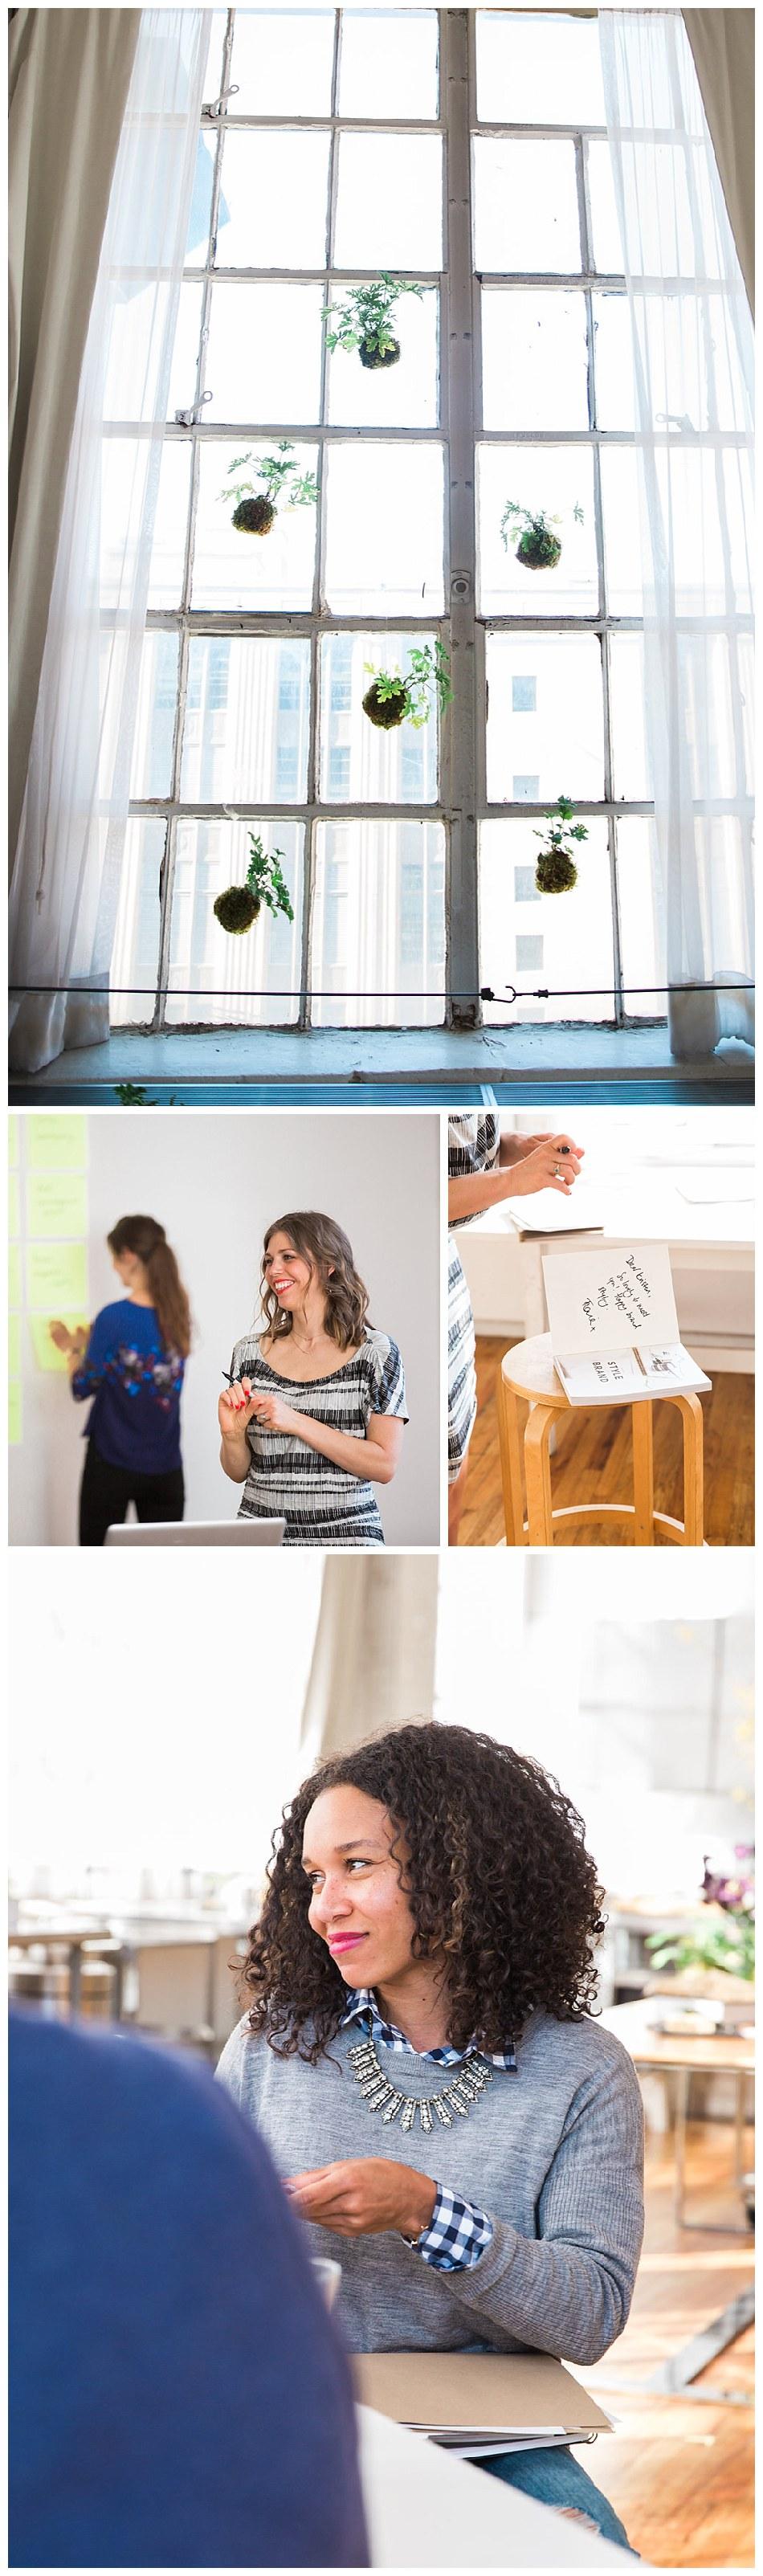 The Brand Stylist Colour Psychology Workshop New York Fiona Humberstone_0051